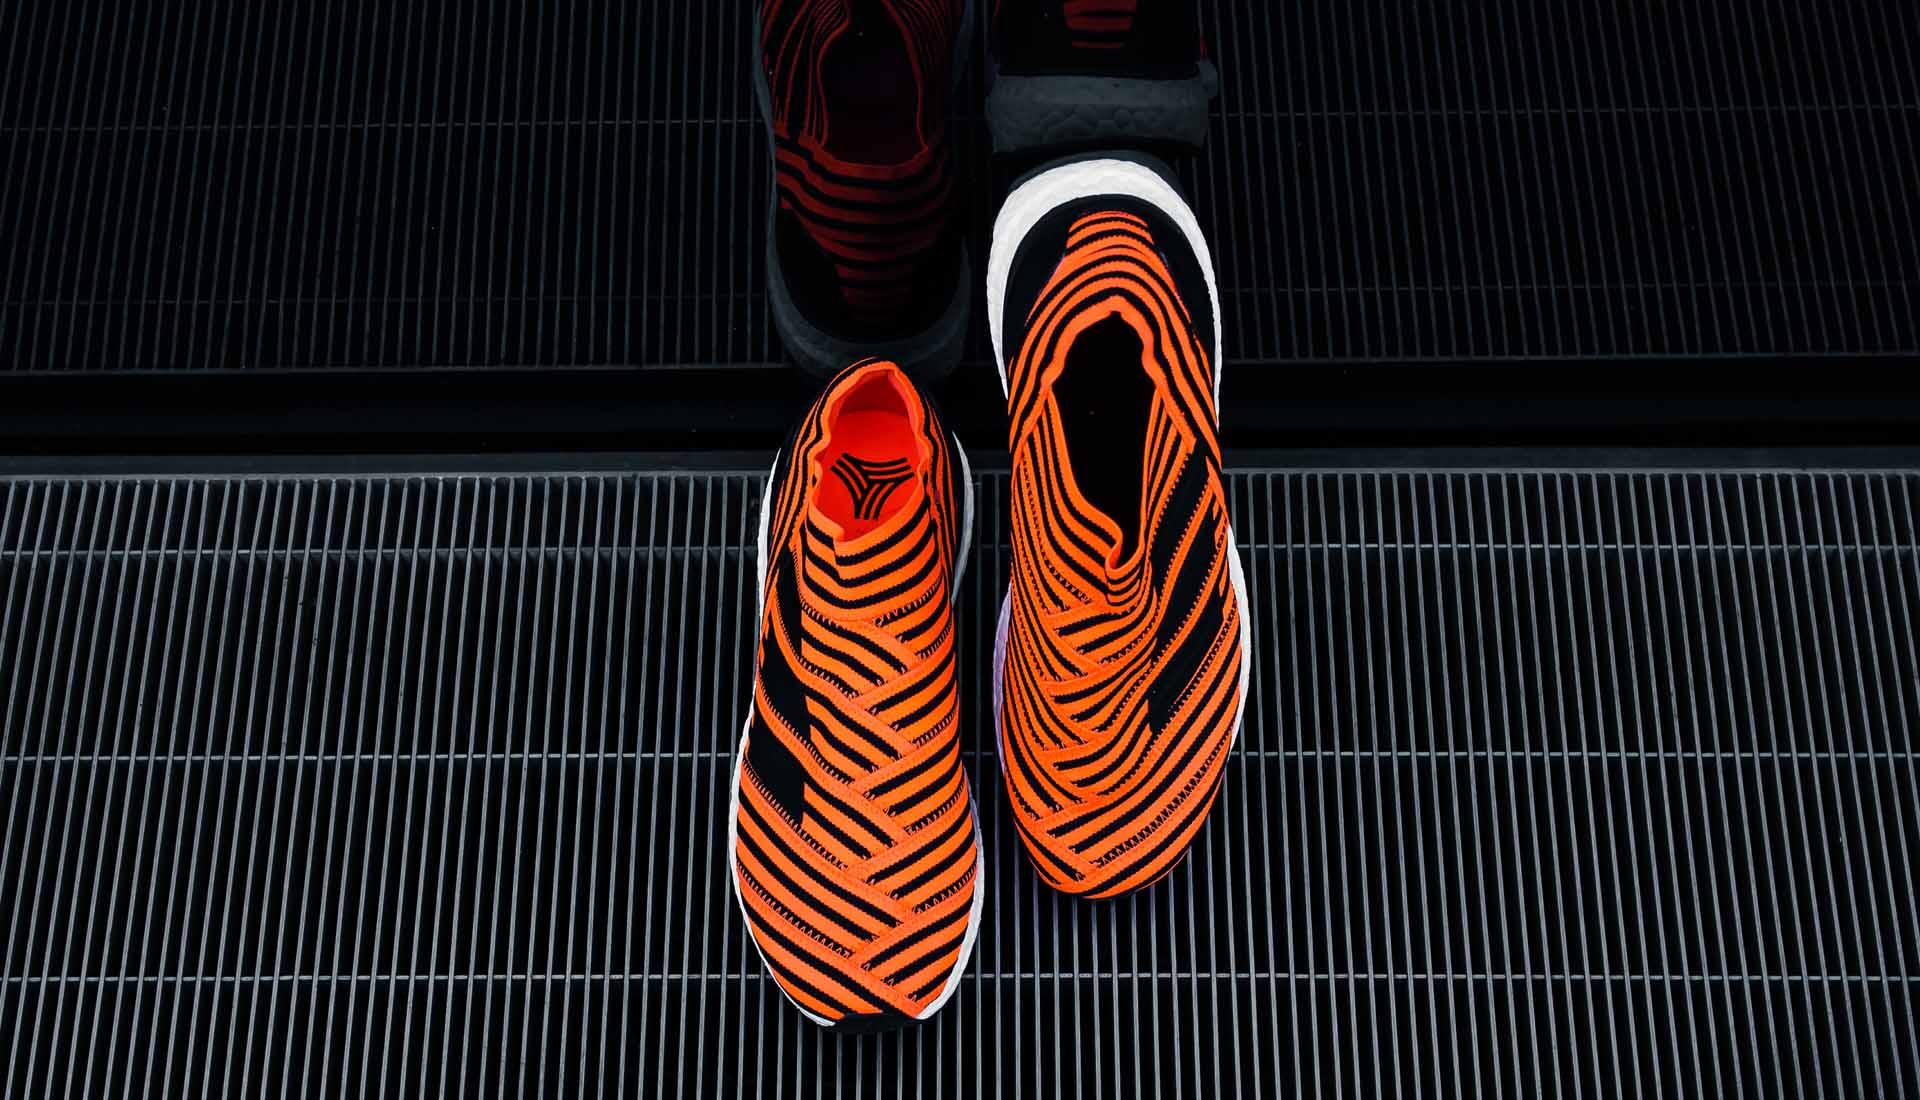 pyro-ultraboost-adidas-nemeziz-2-min.jpg